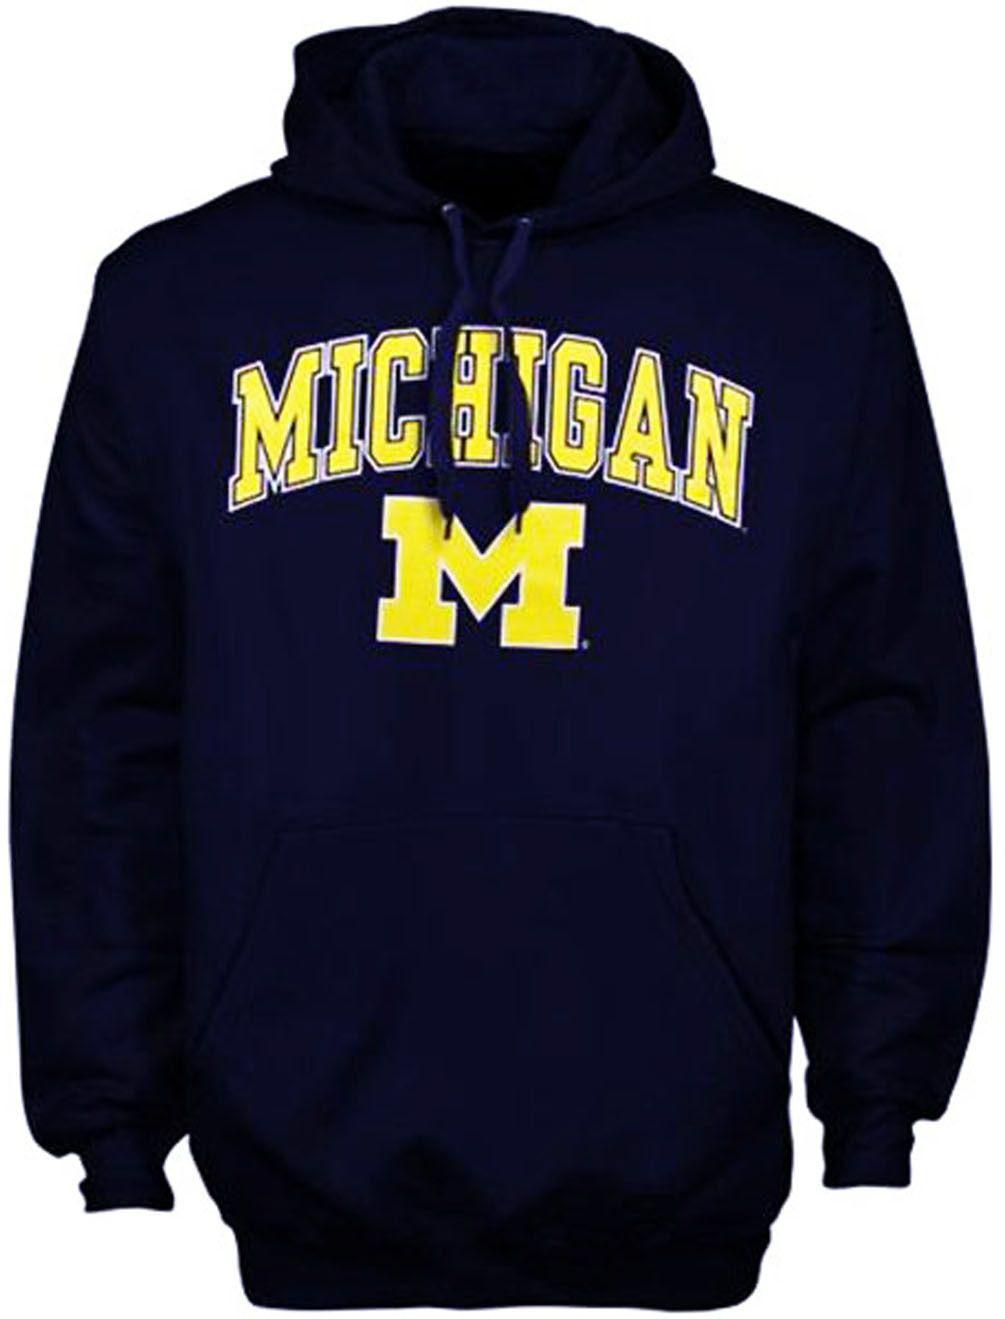 University Of Michigan Sweatshirt Hoodie Wolverines T Shirt Hat Jersey Apparel Ebay Michigan Sweatshirt University Of Michigan Apparel Tech Clothing [ 1319 x 1005 Pixel ]